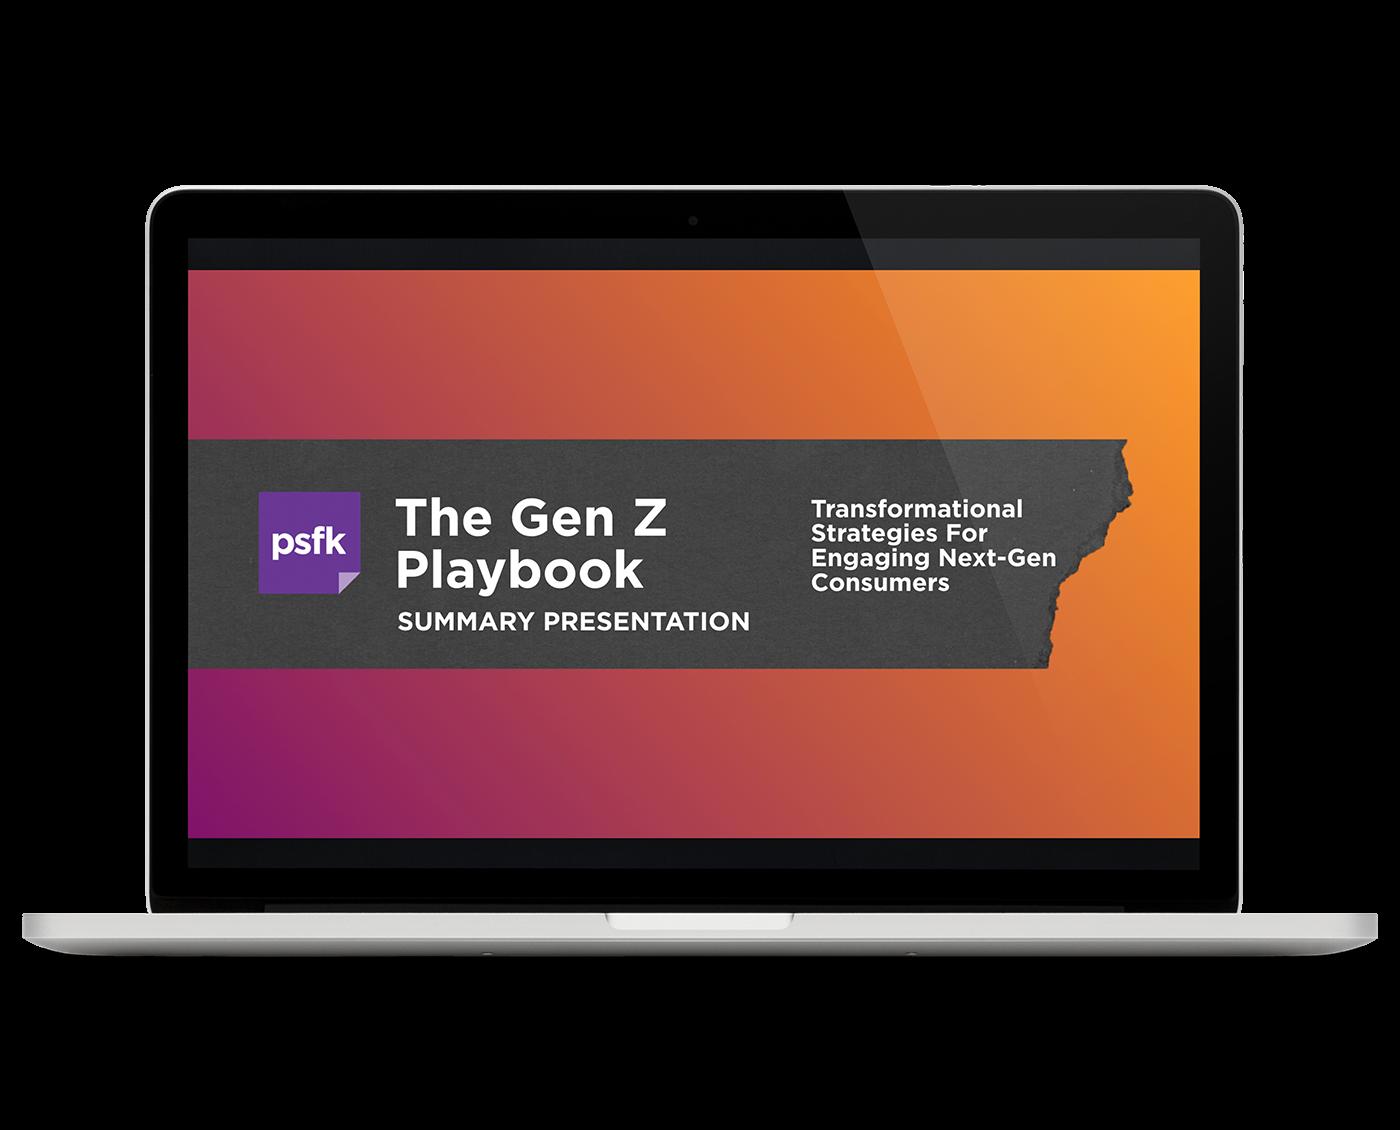 The Gen Z Playbook